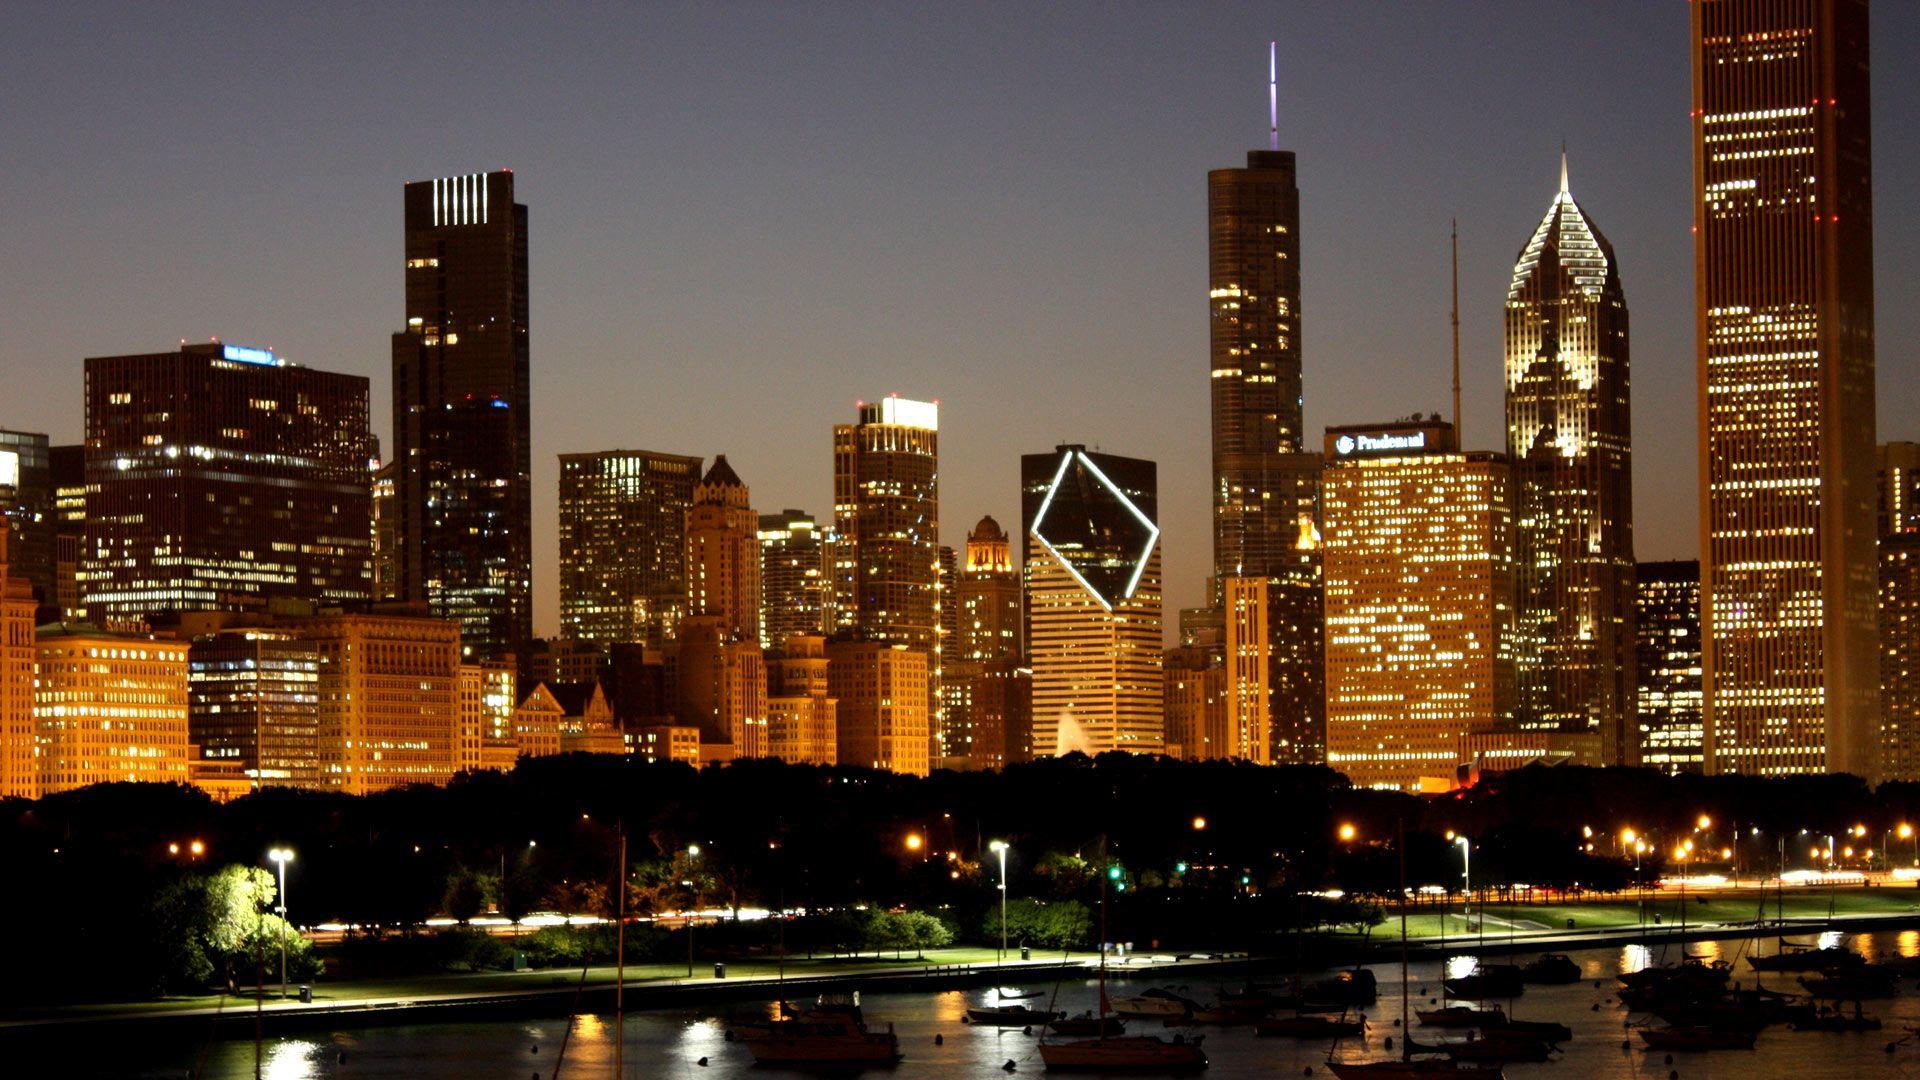 Chicago skyline wallpaper world wallpapers hd wallpapers chicago skyline wallpaper world wallpapers voltagebd Gallery